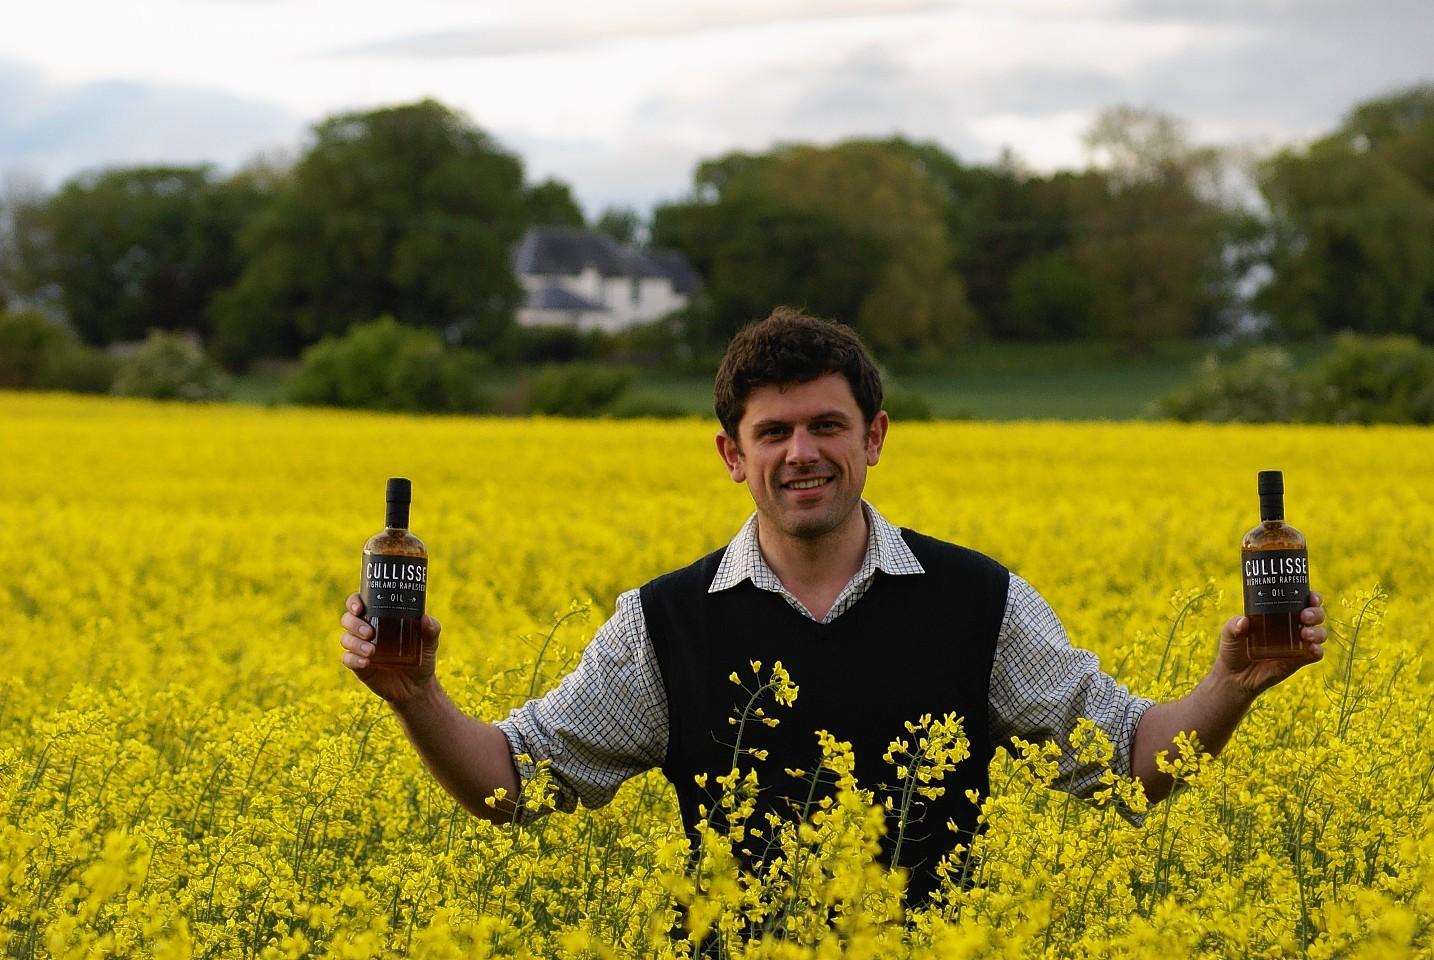 Robert Mackenzie, managing director of Cullisse Highland Rapeseed Oil